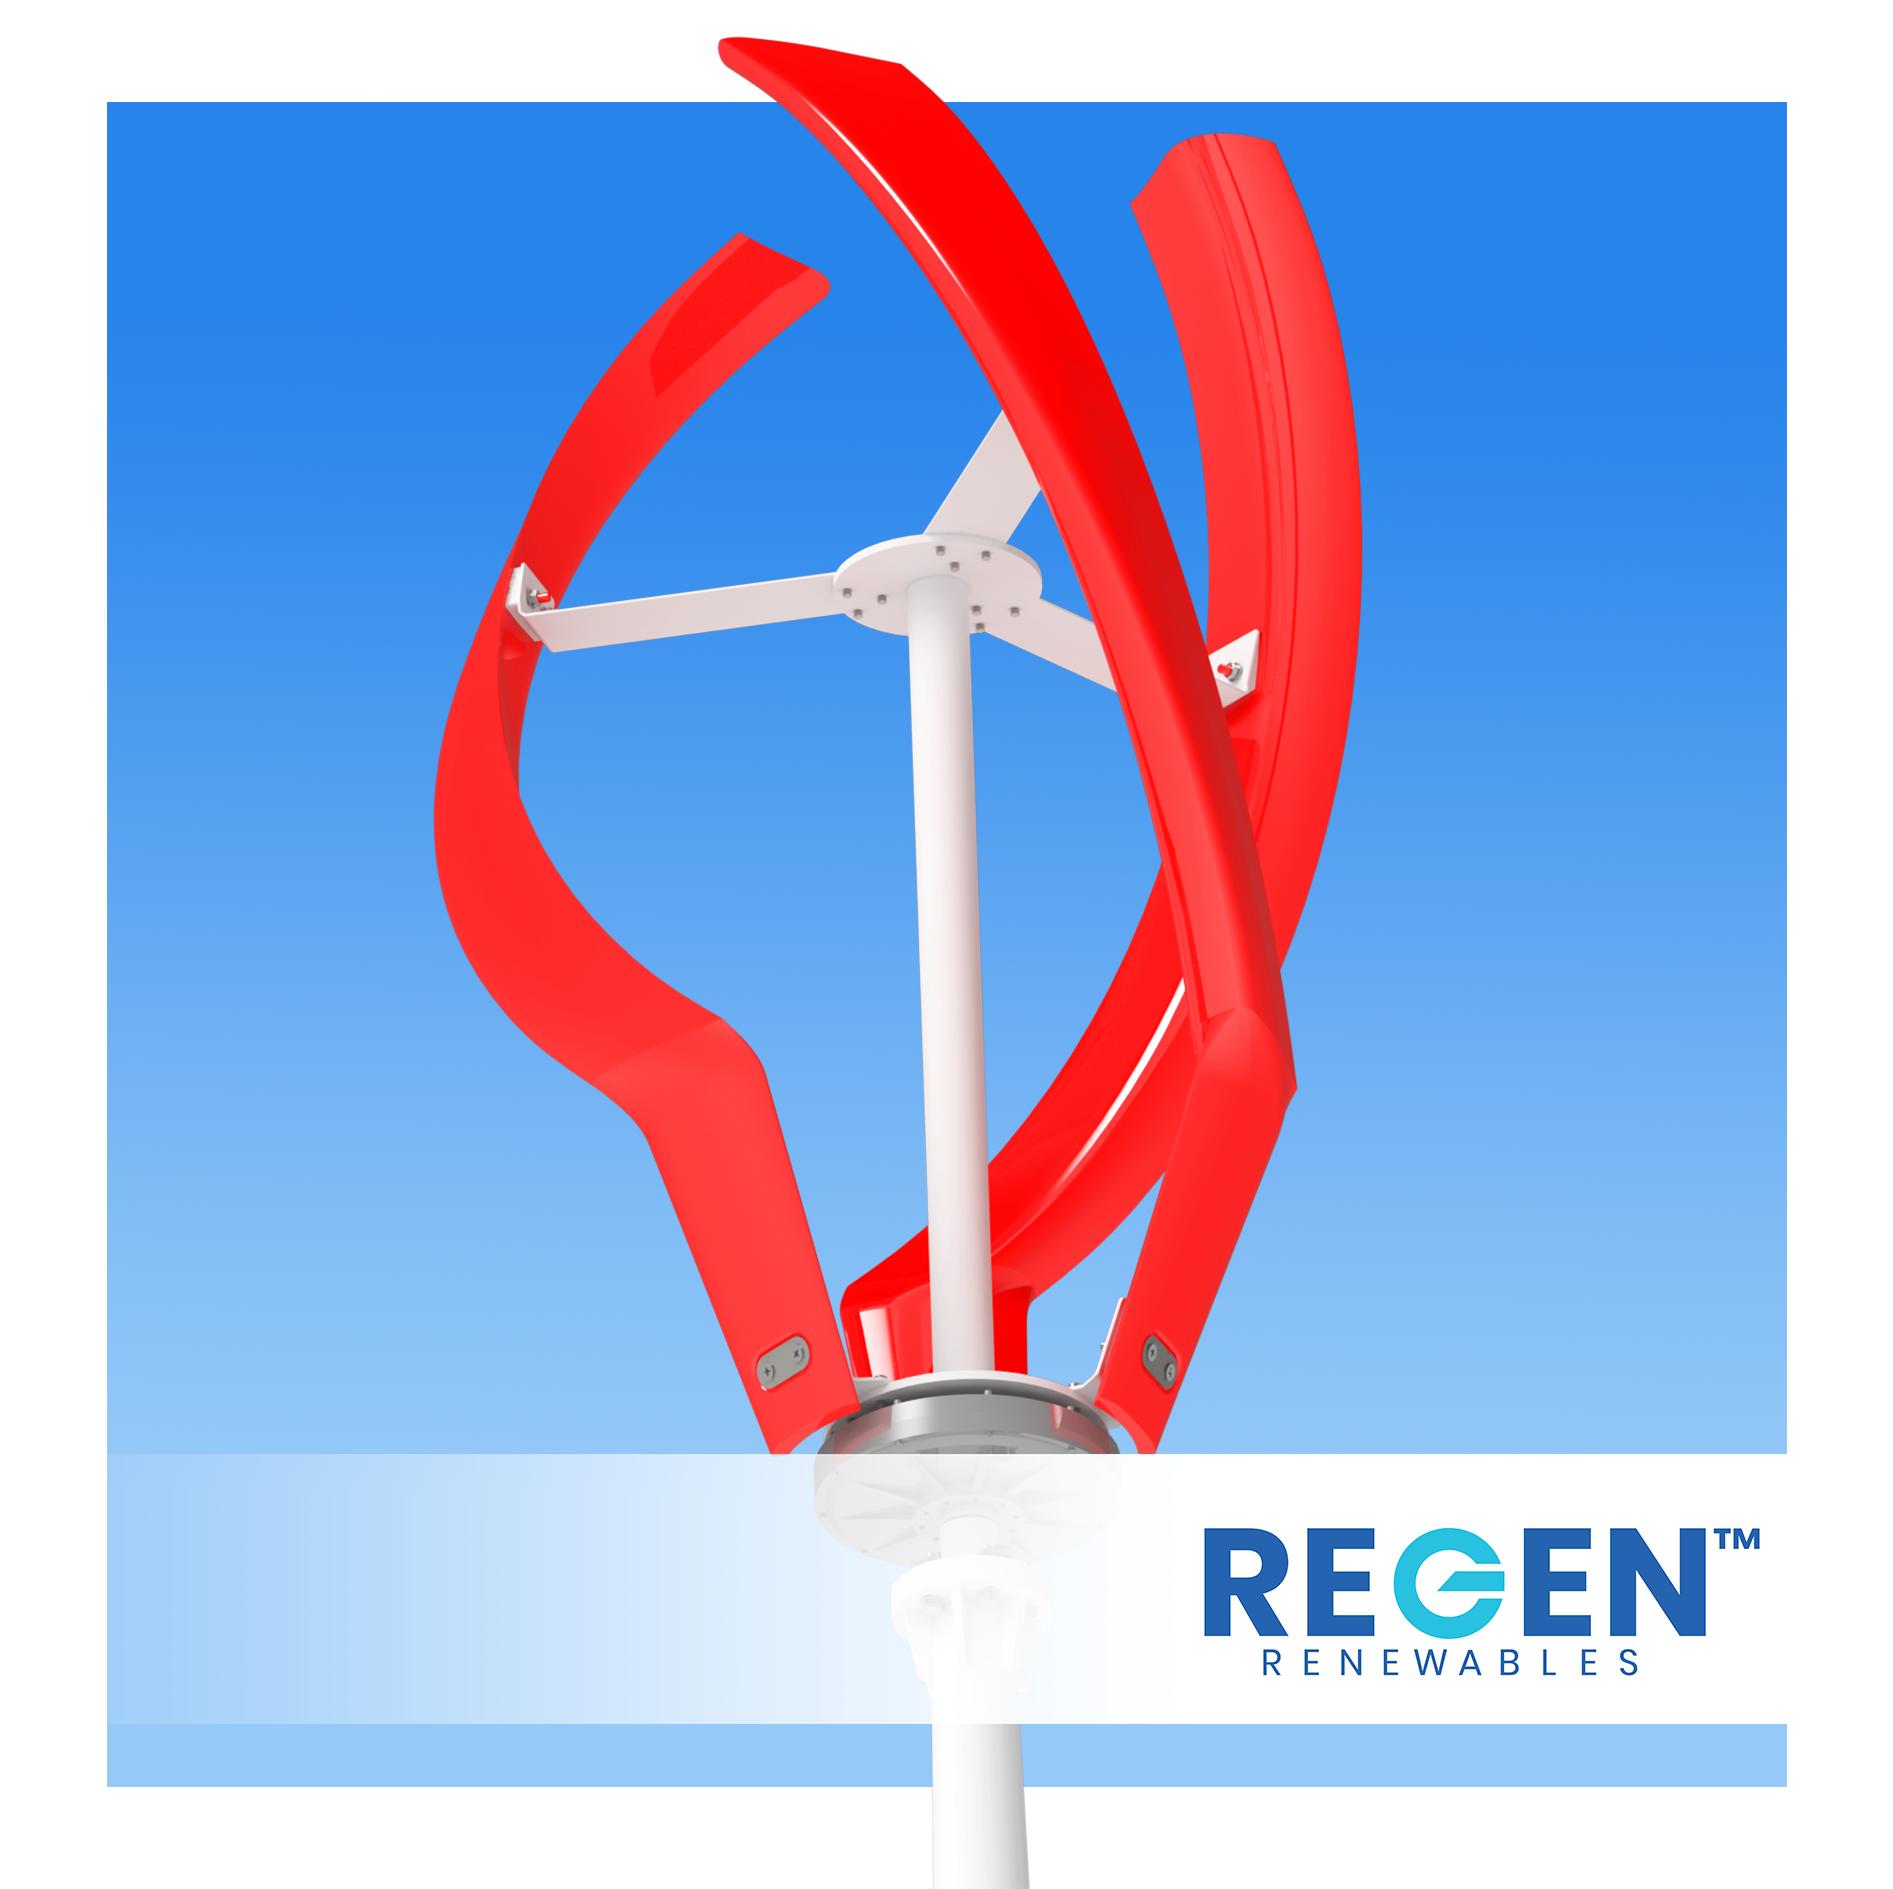 ReGen_VT GR600W 48V 3 Blade Image